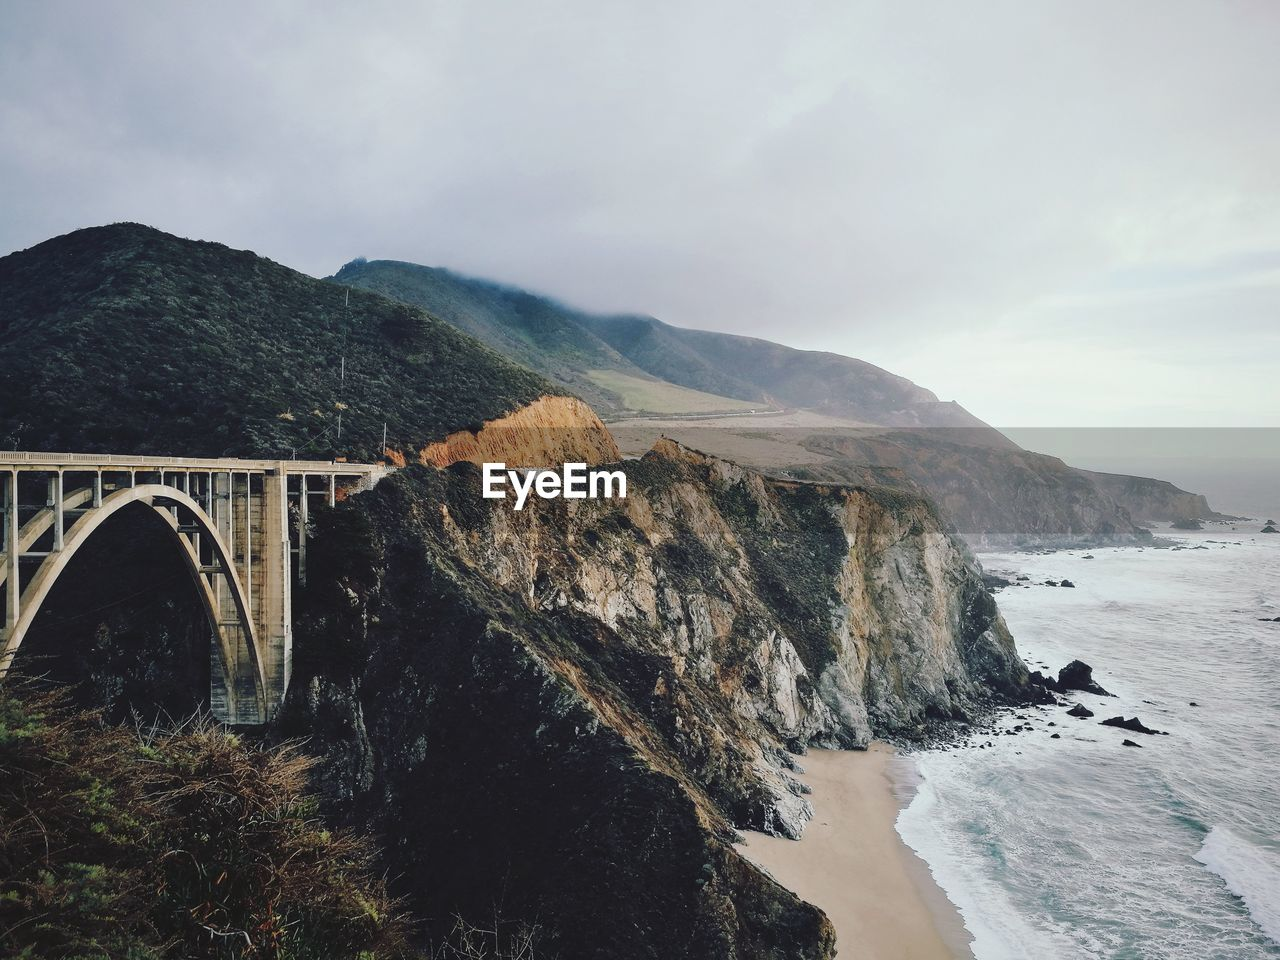 ARCH BRIDGE OVER SEA AGAINST MOUNTAINS